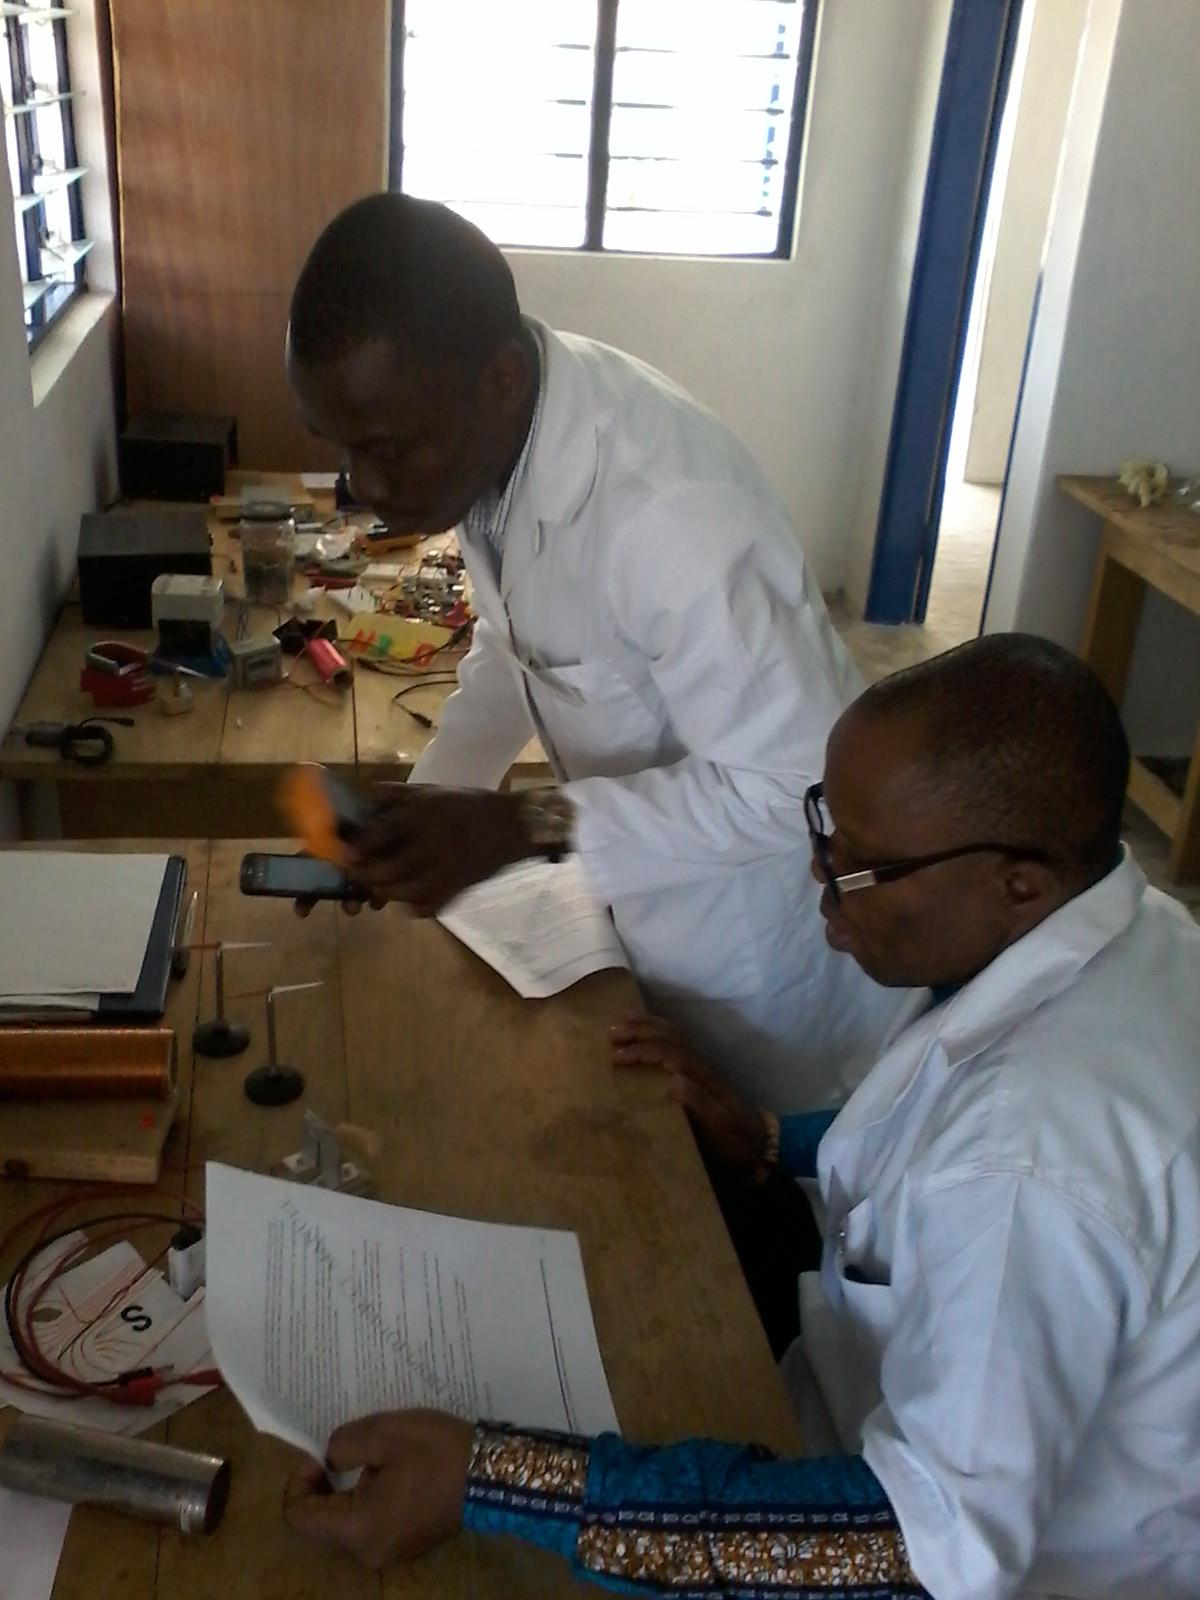 http://www.africadeveloppement.org/wp-content/uploads/2017/09/20170801_135602.jpg